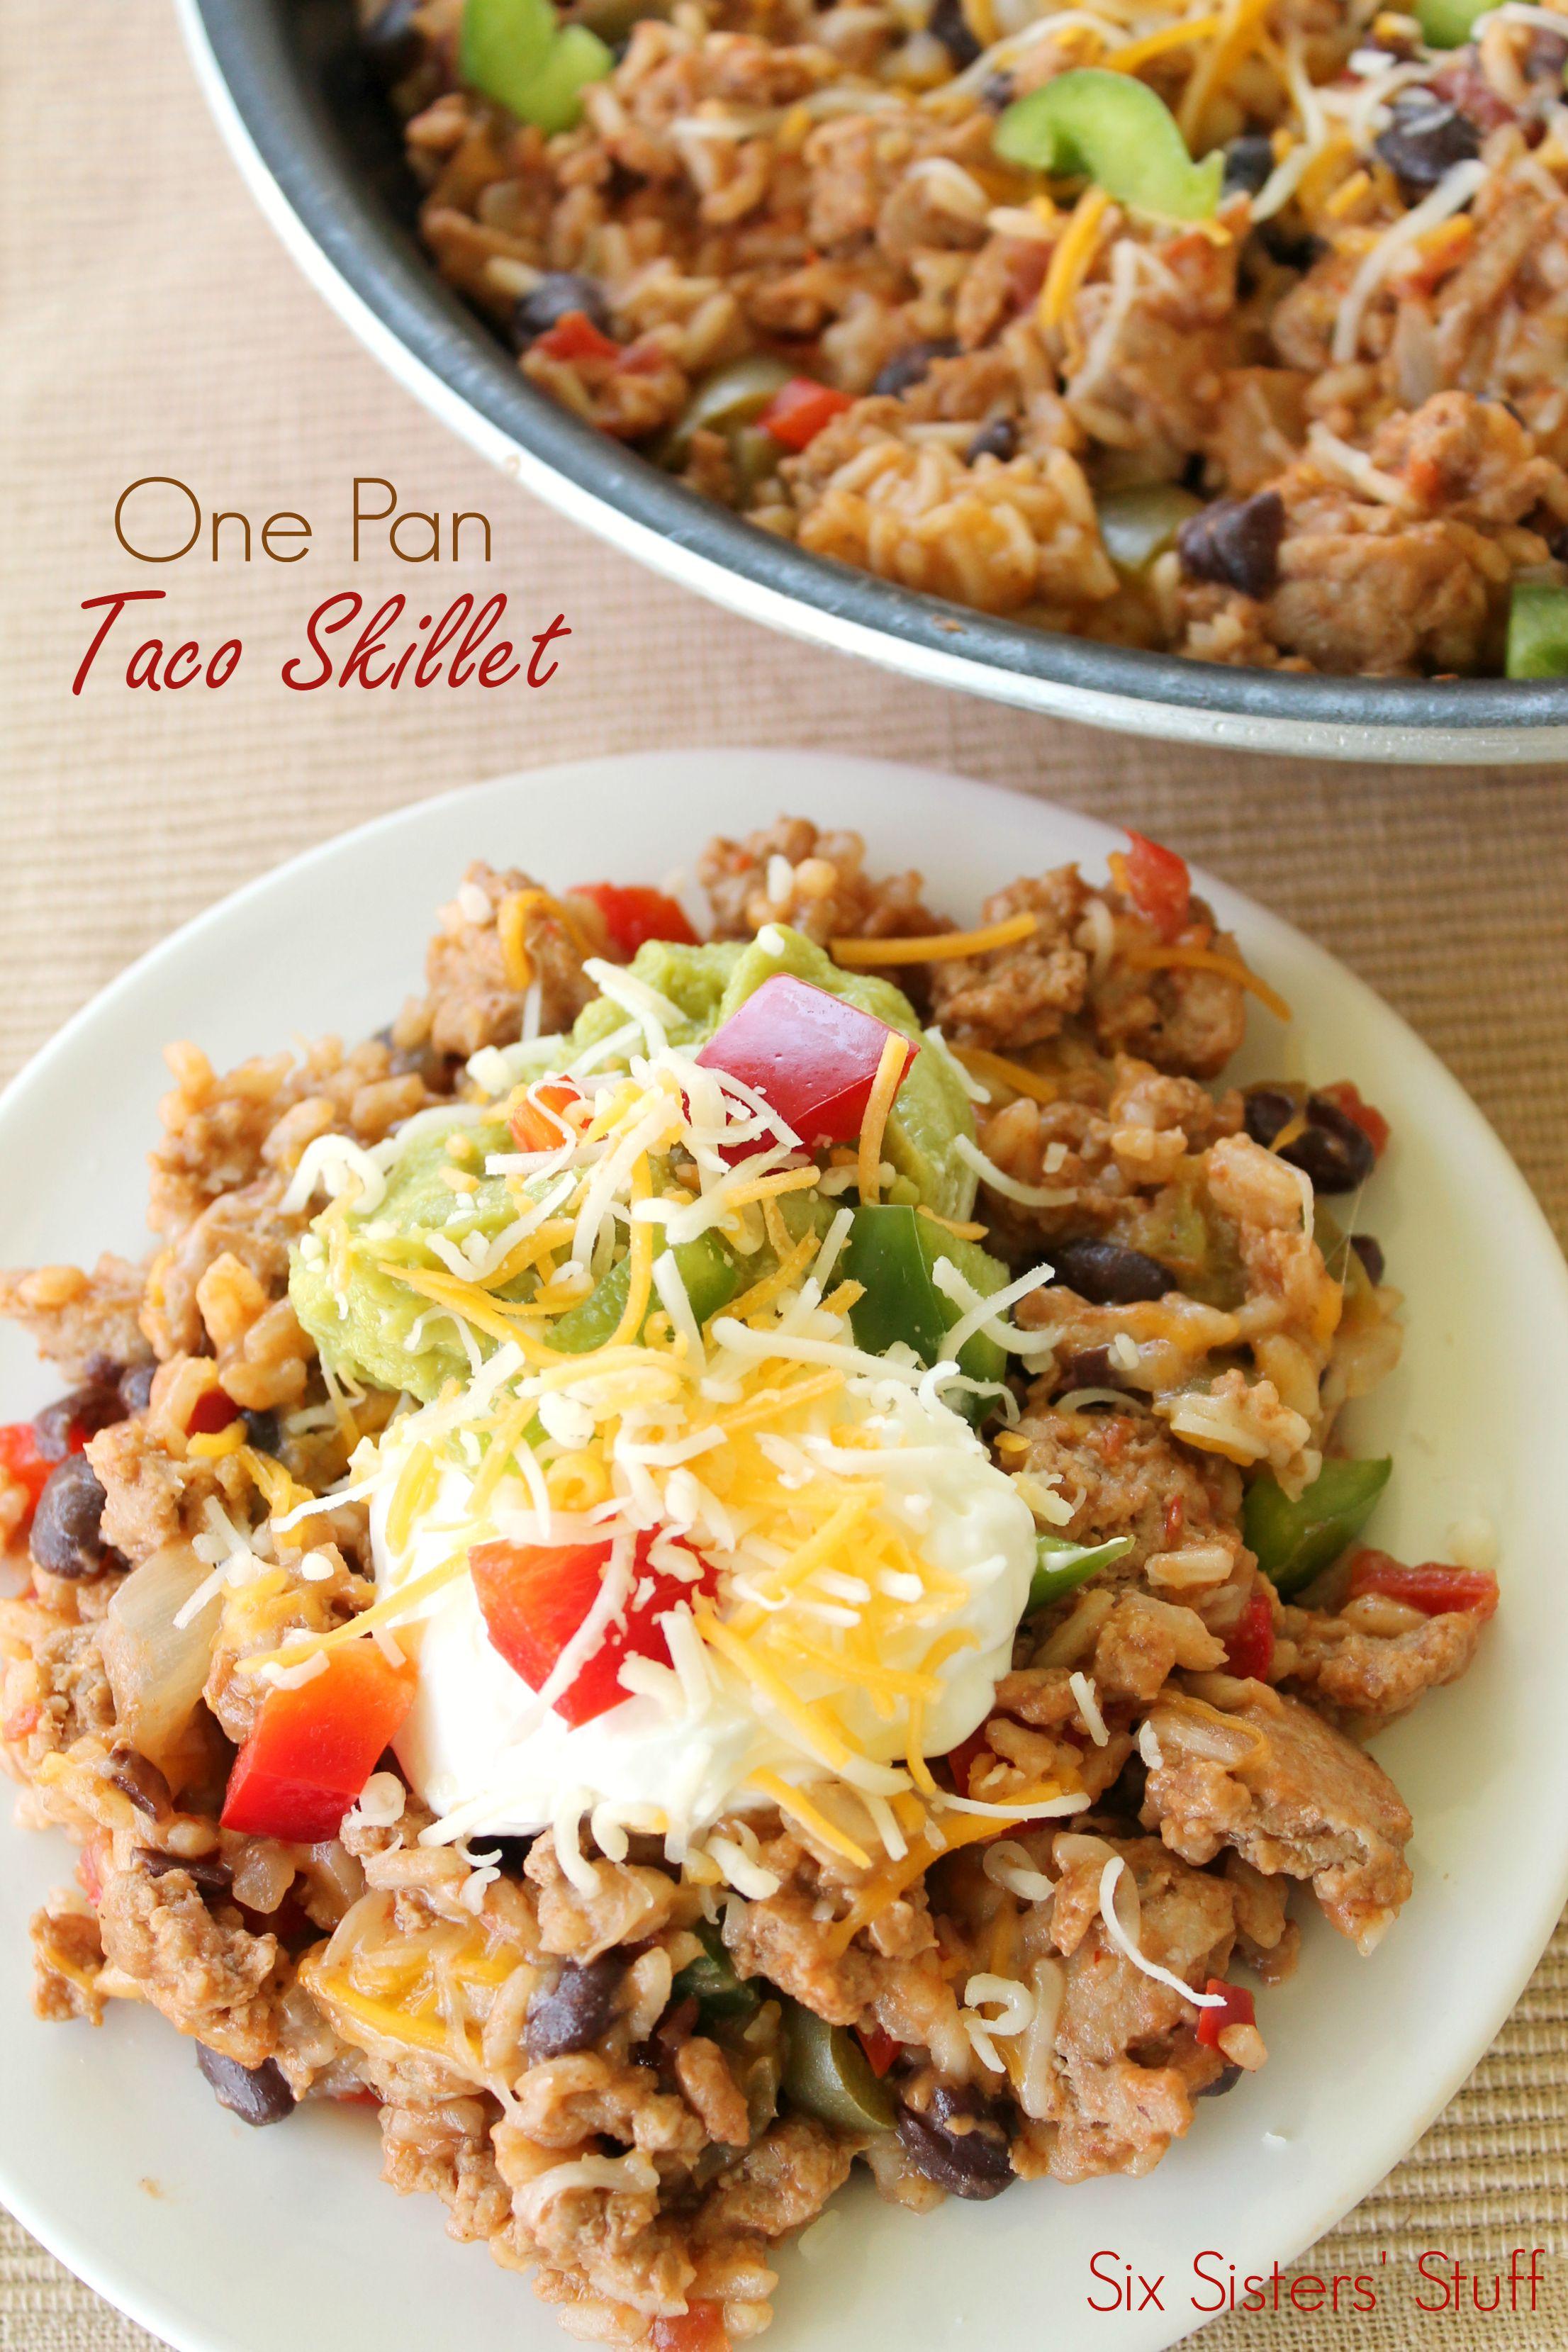 One Pan Taco Skillet